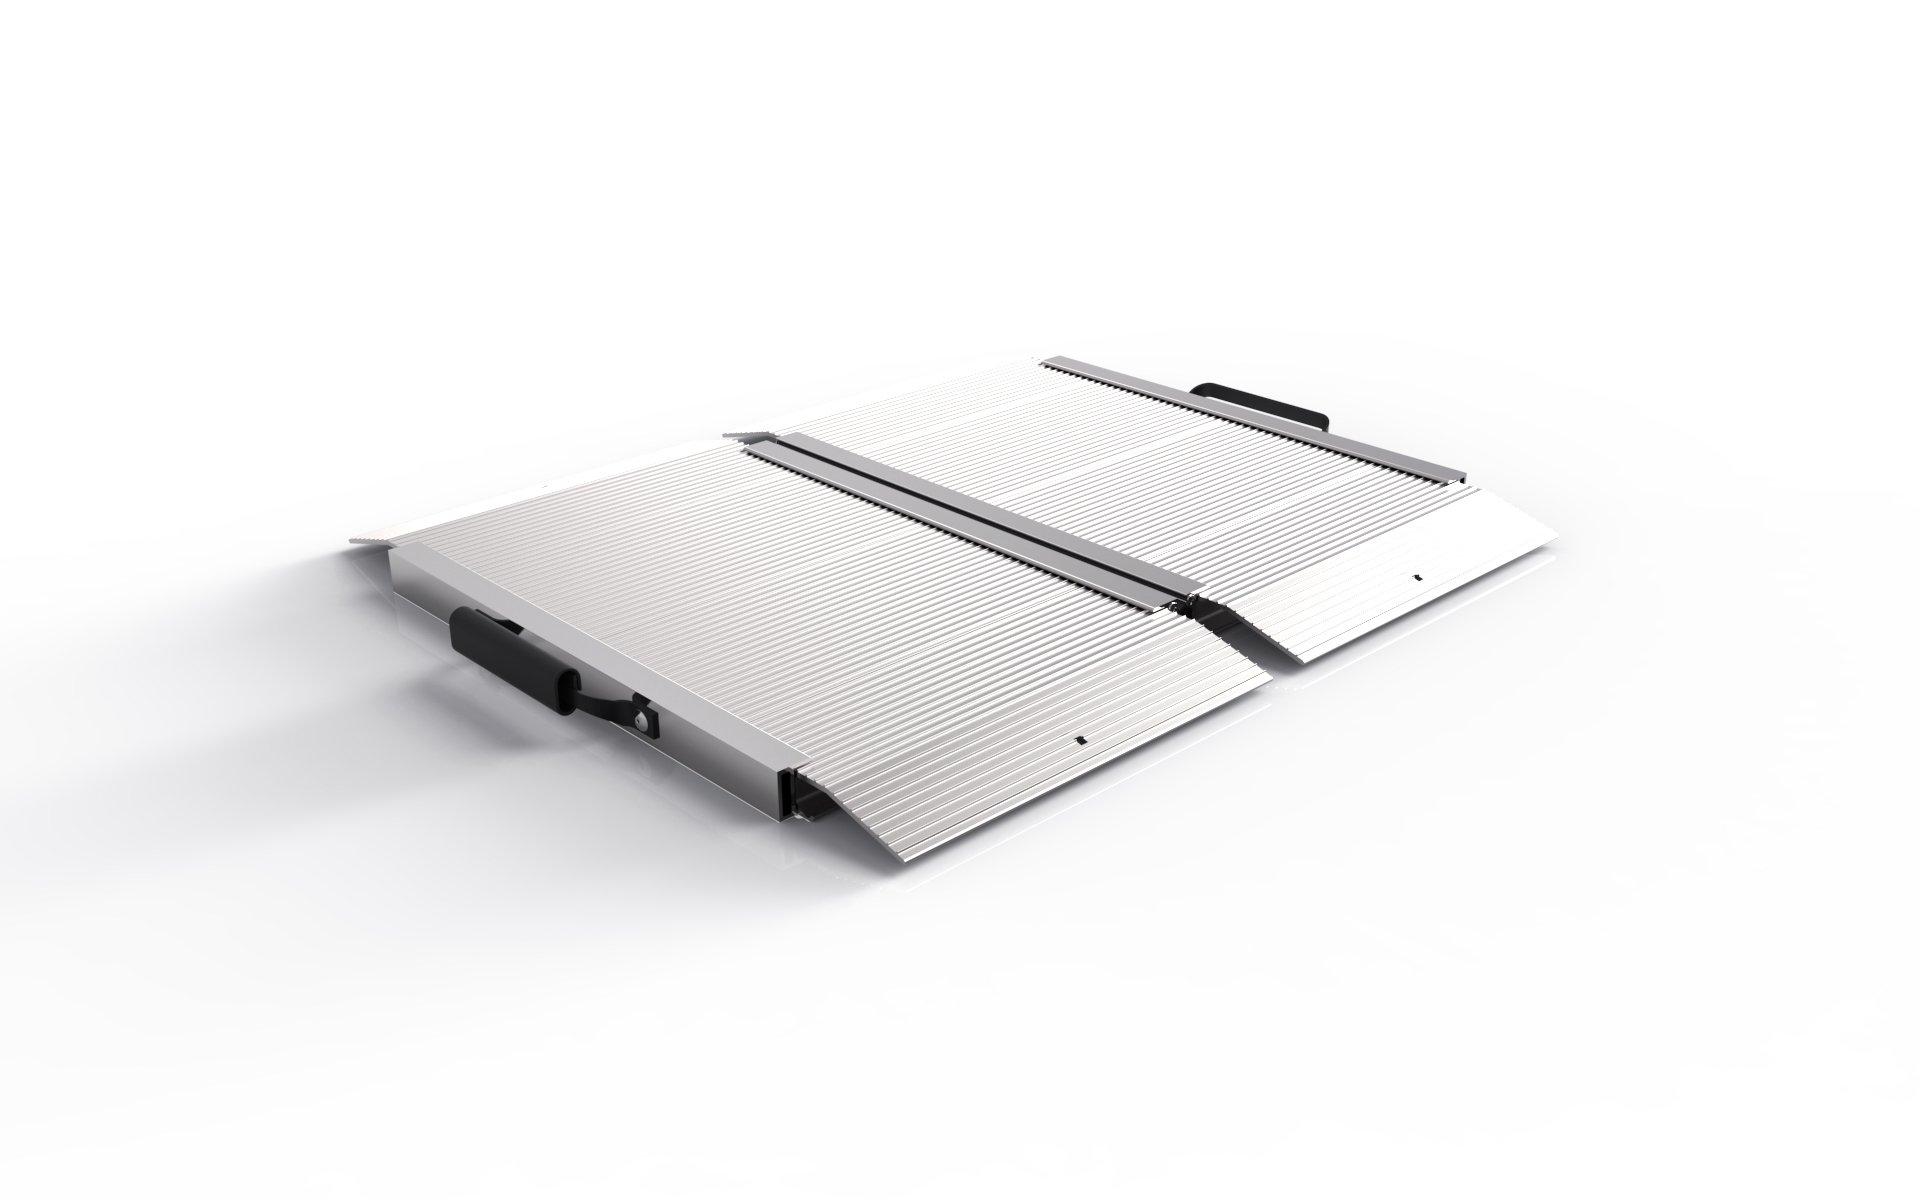 EZ-ACCESS TRAVERSE SFEL02 Single Fold Edgeless Ramp, 2', 1600 lb. Capacity, 24'' Length, 31'' Width, 1.575'' Height